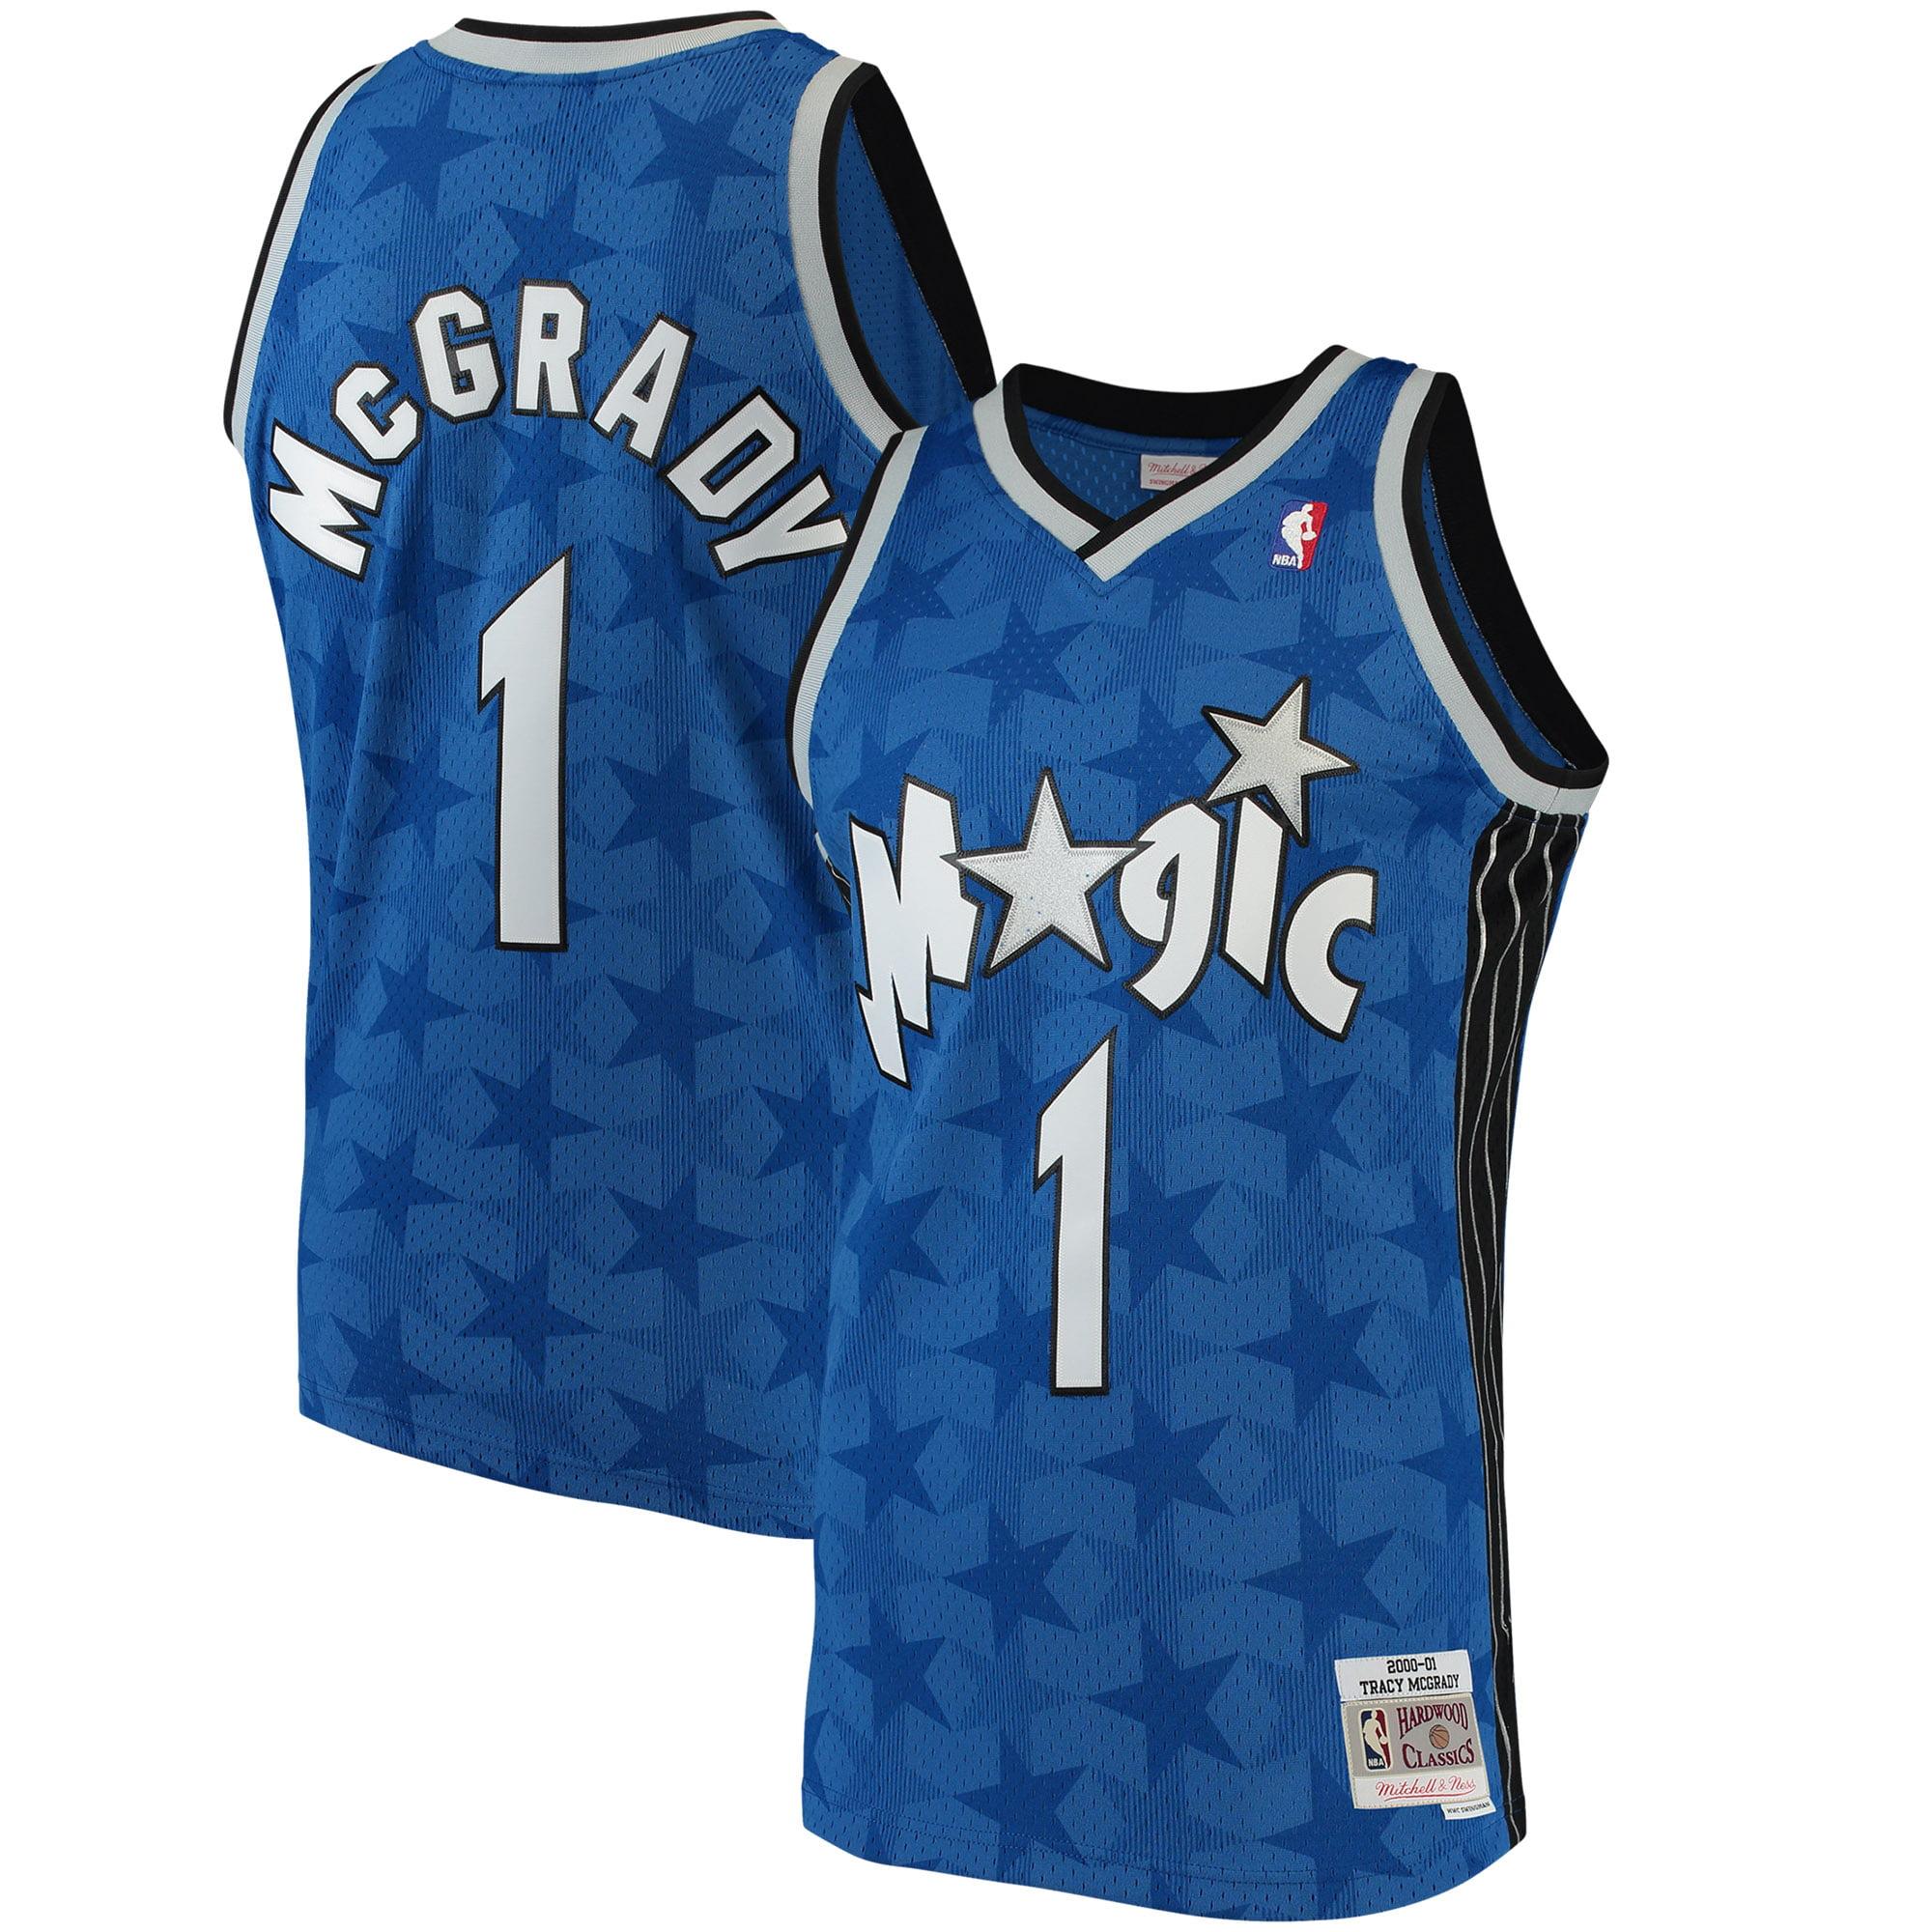 Tracy McGrady Orlando Magic Mitchell & Ness 2001-02 Hardwood Classics Swingman Jersey - Blue